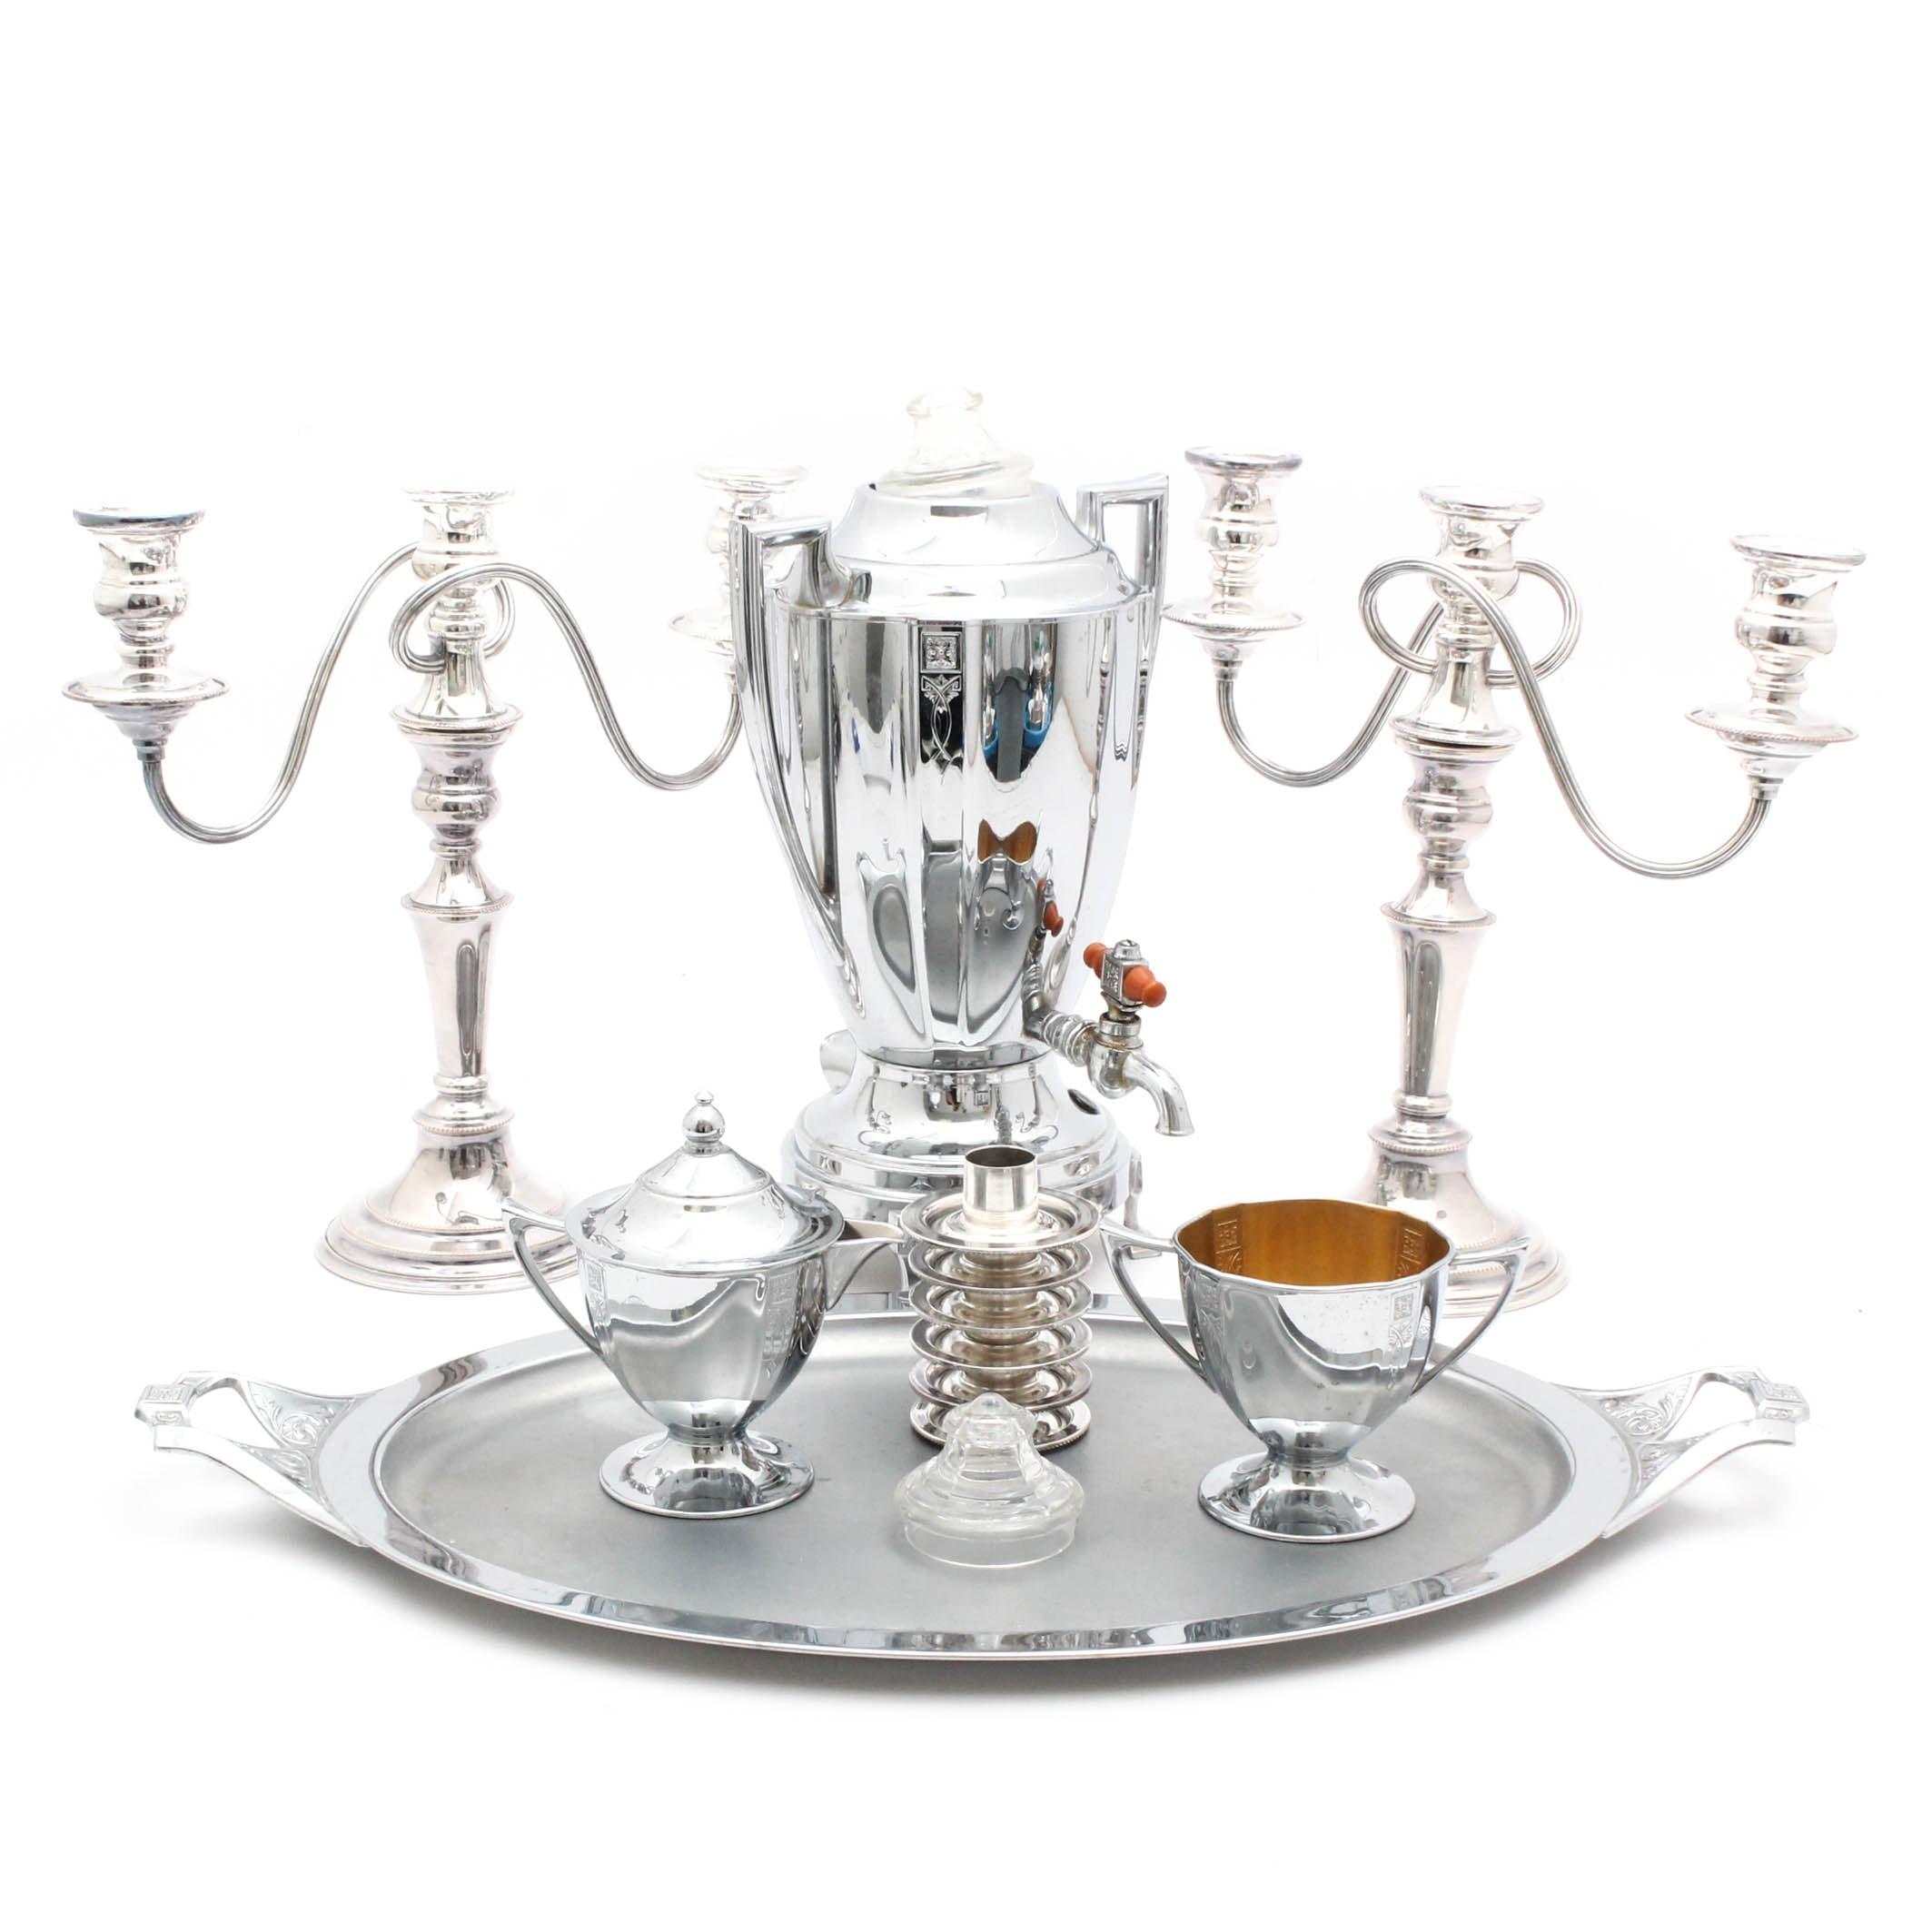 English Silverplate Candelabra and Royal Rochester Coffee Percolator Set